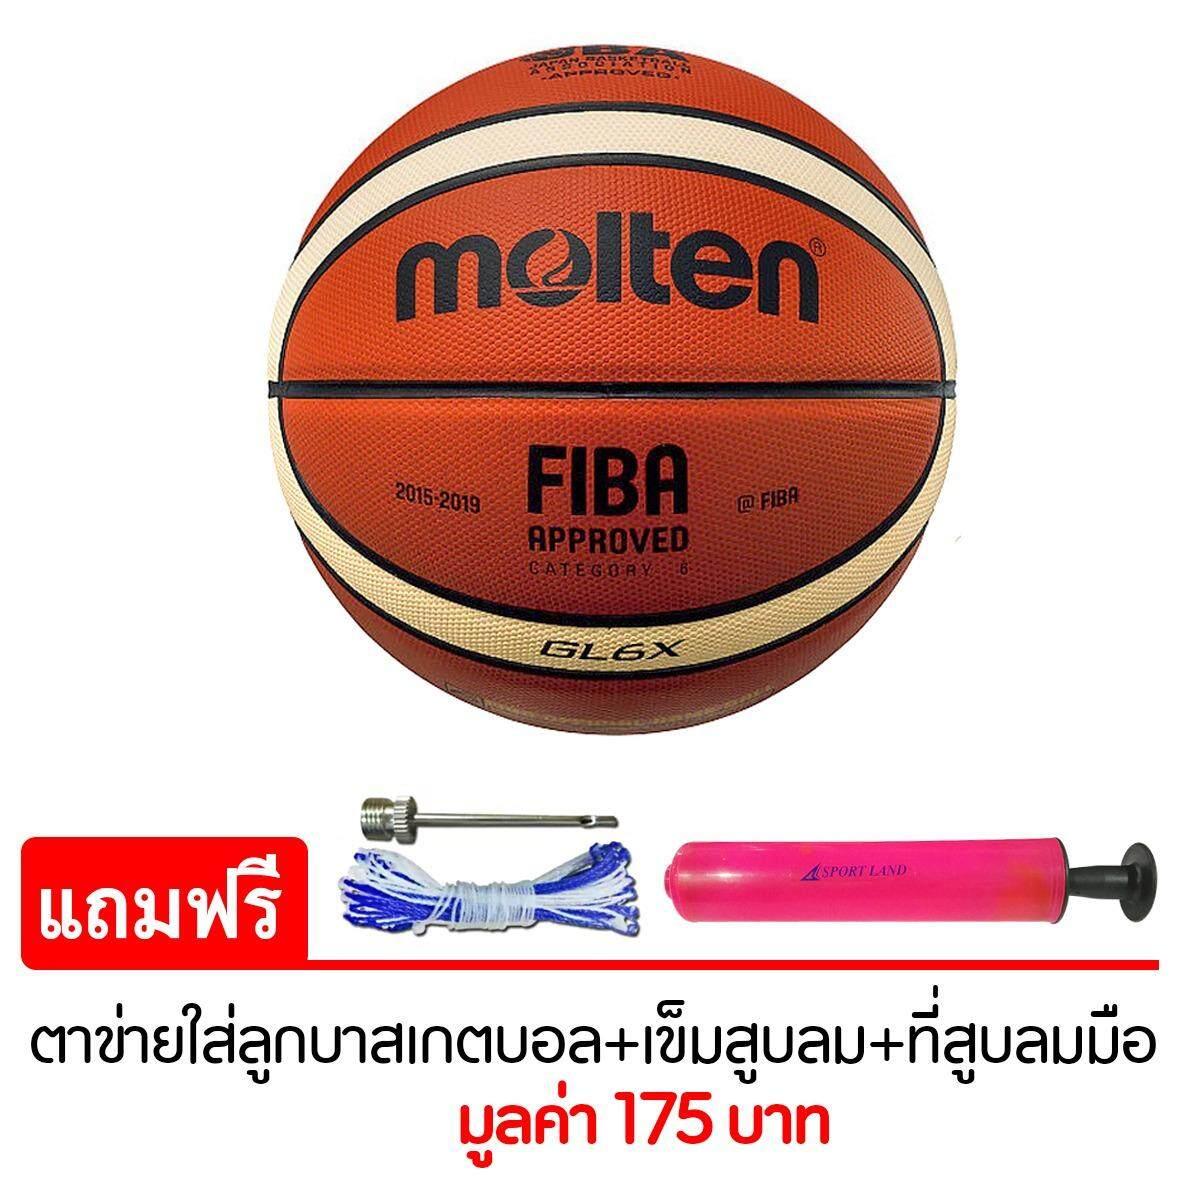 MOLTEN บาสเก็ตบอล ใช้ในการแข่งขัน ซีเกมส์ 2017 รุ่น BGL6X FIBA แถมฟรี ตาข่ายใส่ลูกบาสเกตบอล + เข็มสูบสูบลม + สูบมือ SPL รุ่น SL6 สีชมพู